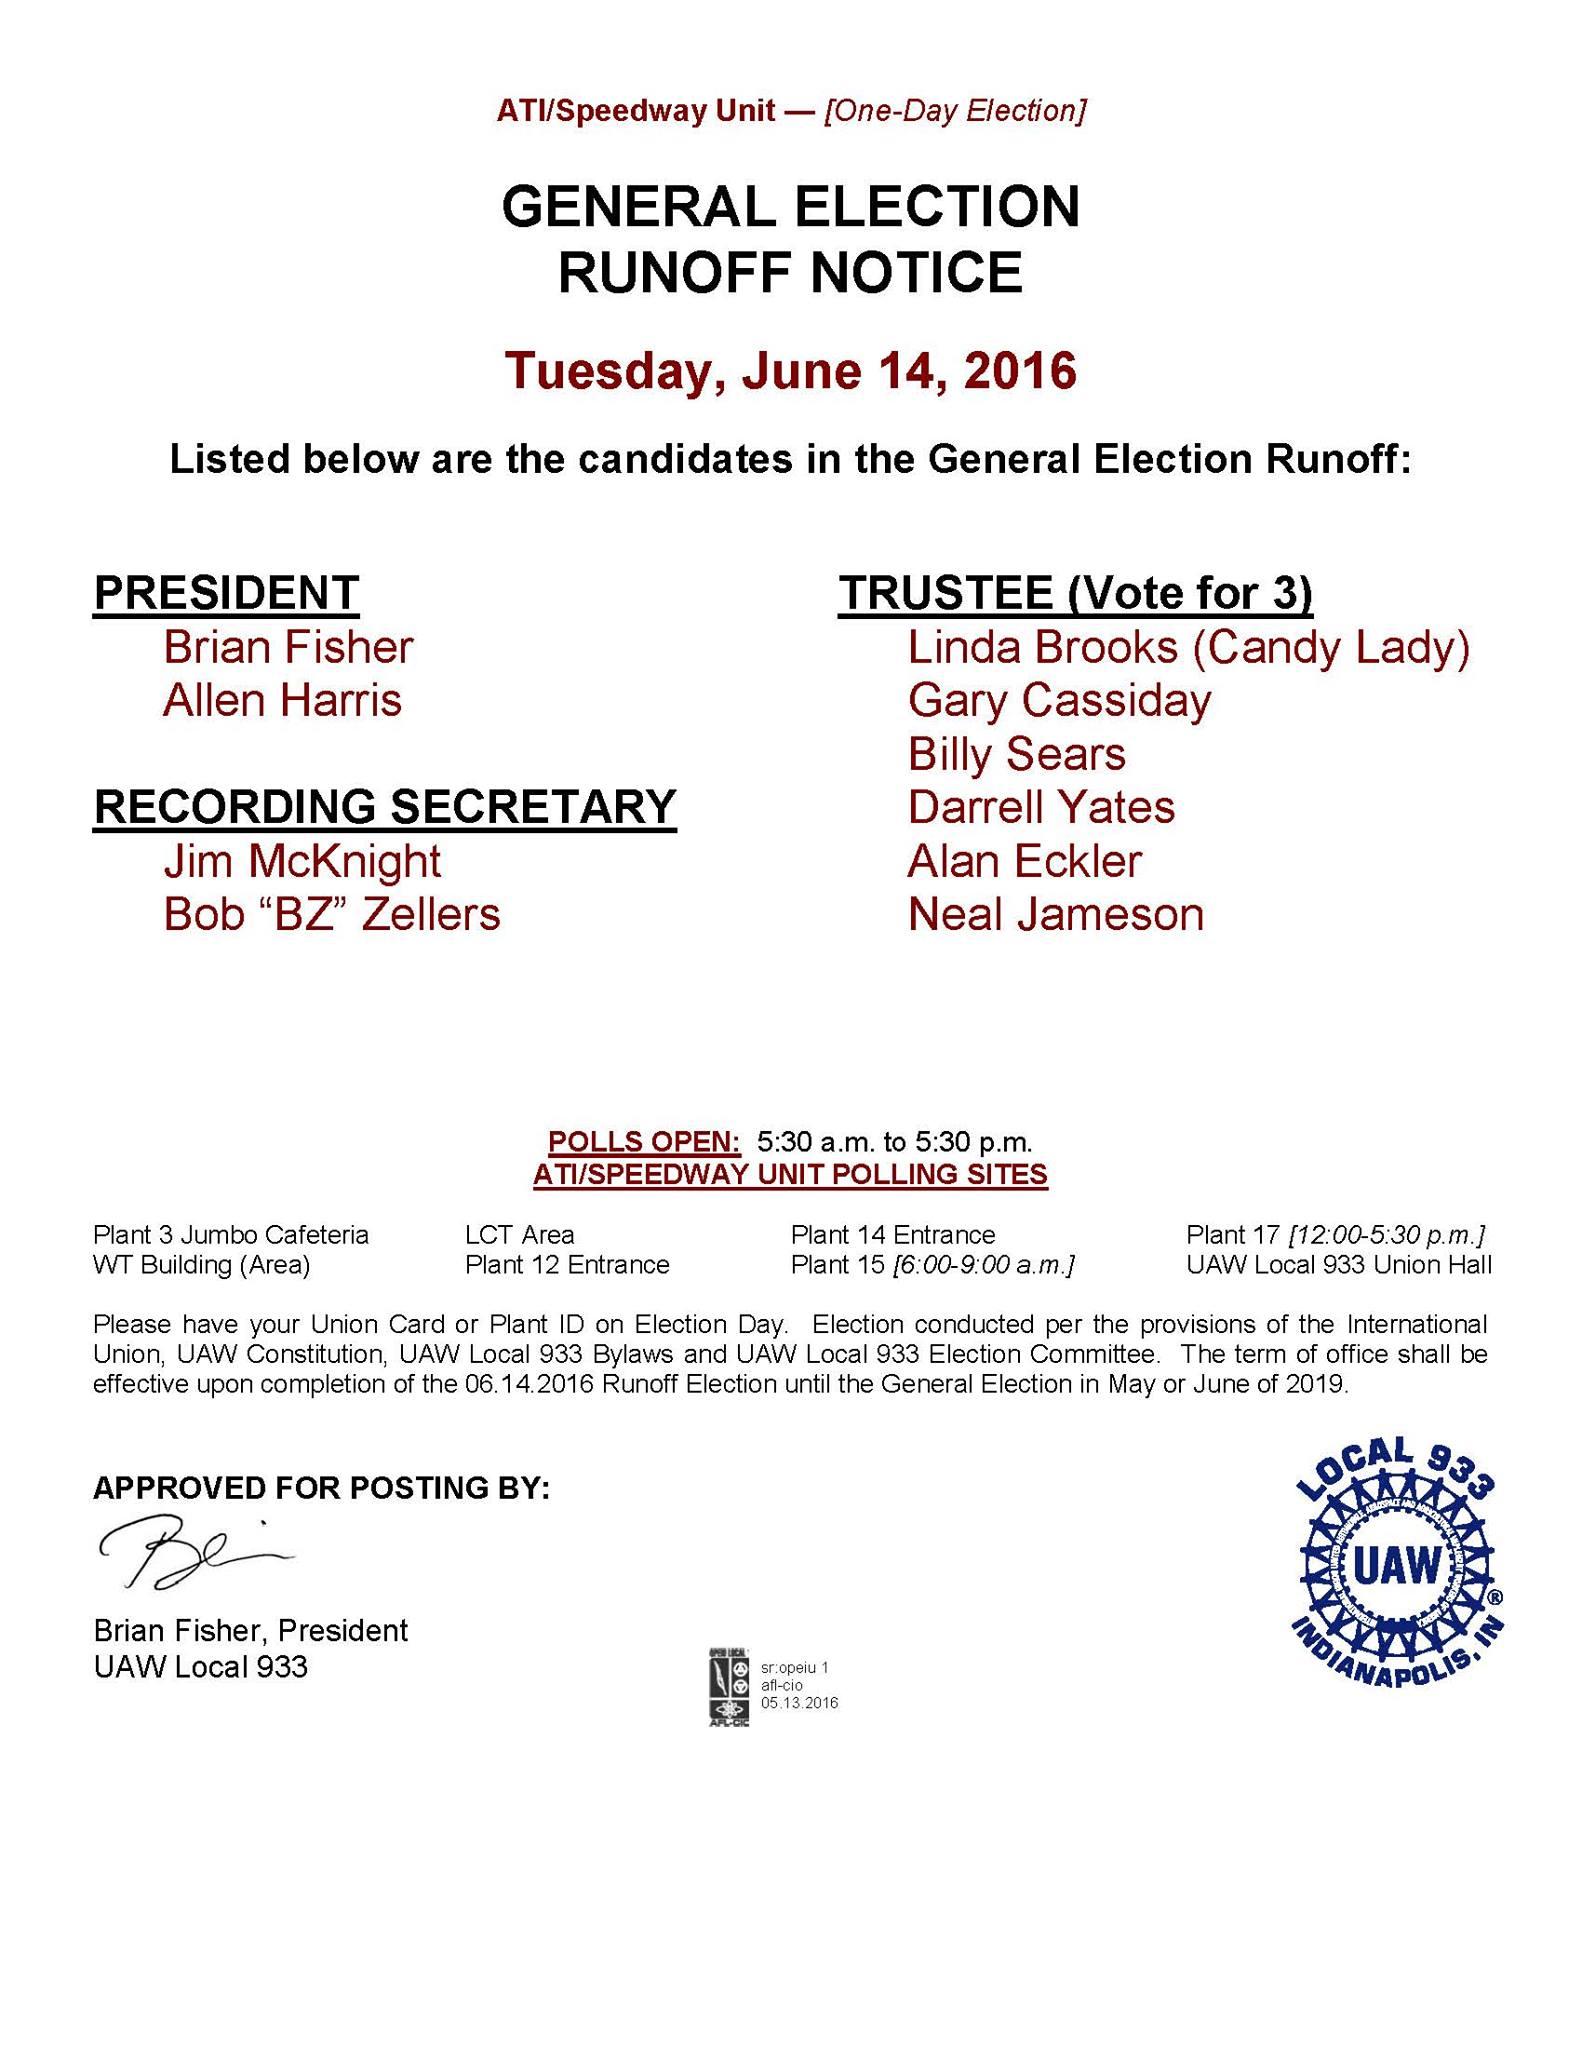 Runoff ATI 16m06d14